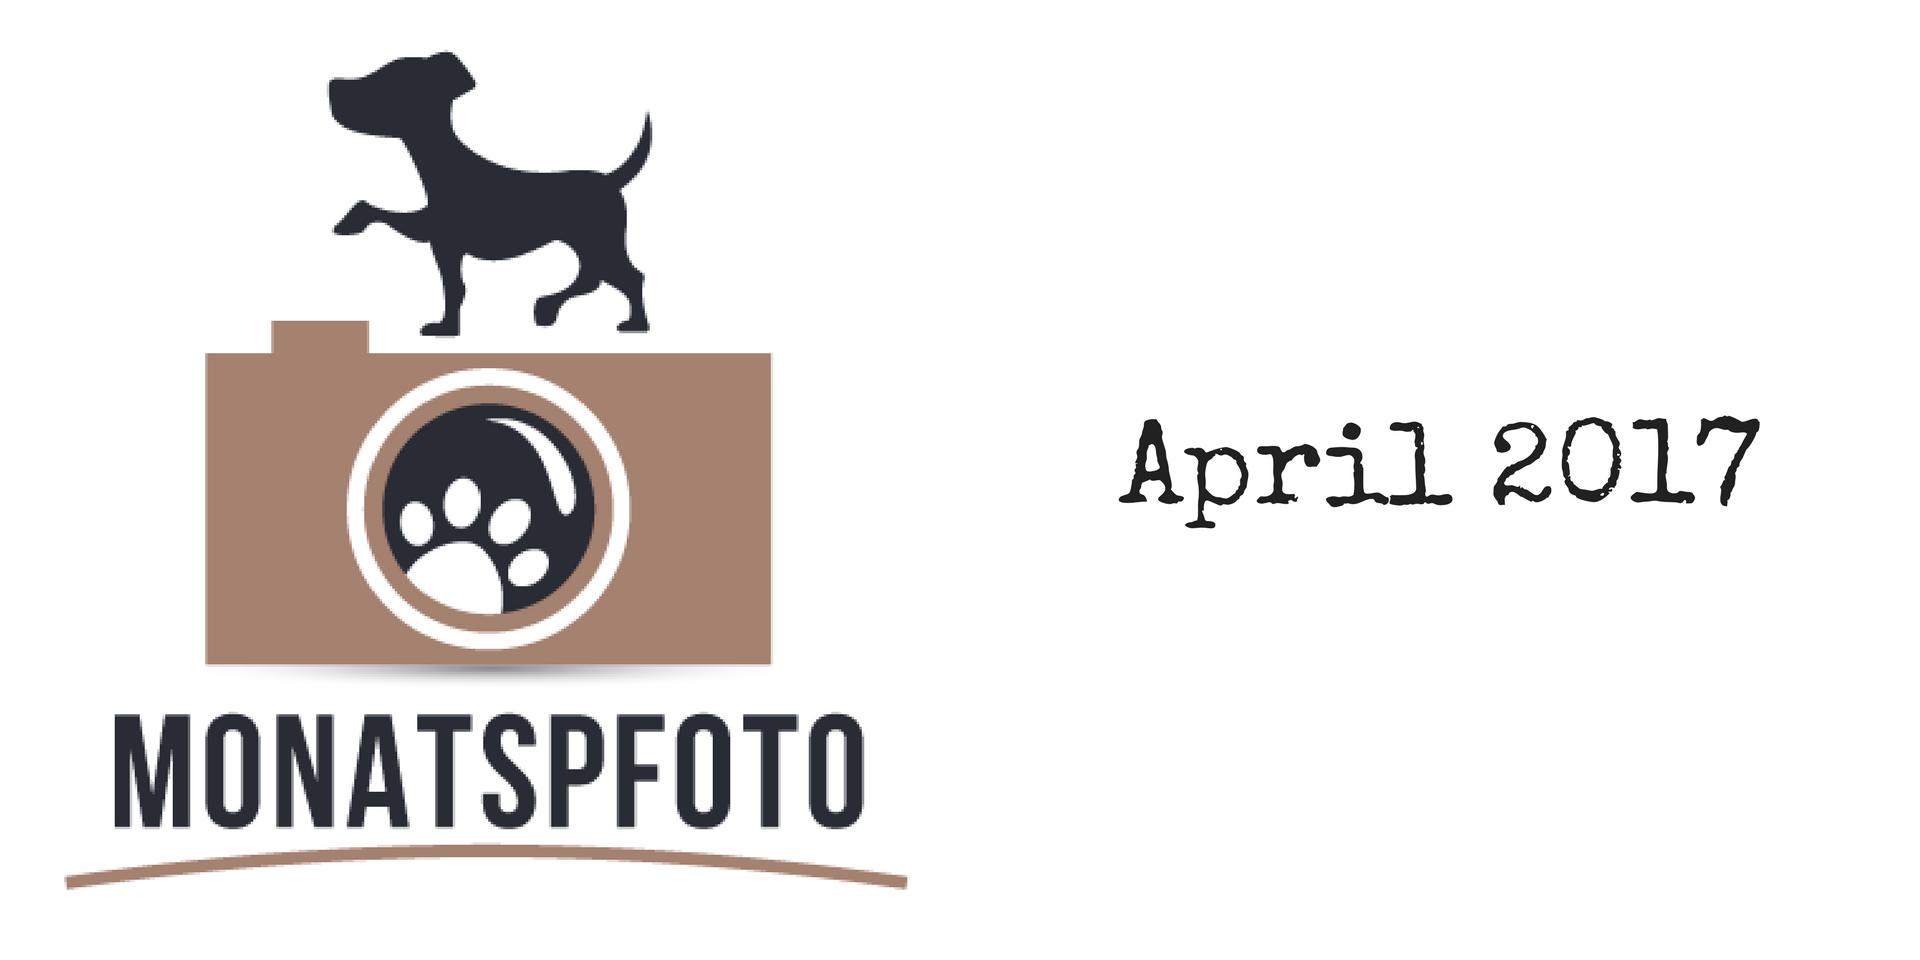 Monatspfoto April 2017 miDoggy Blog Community für Hunde